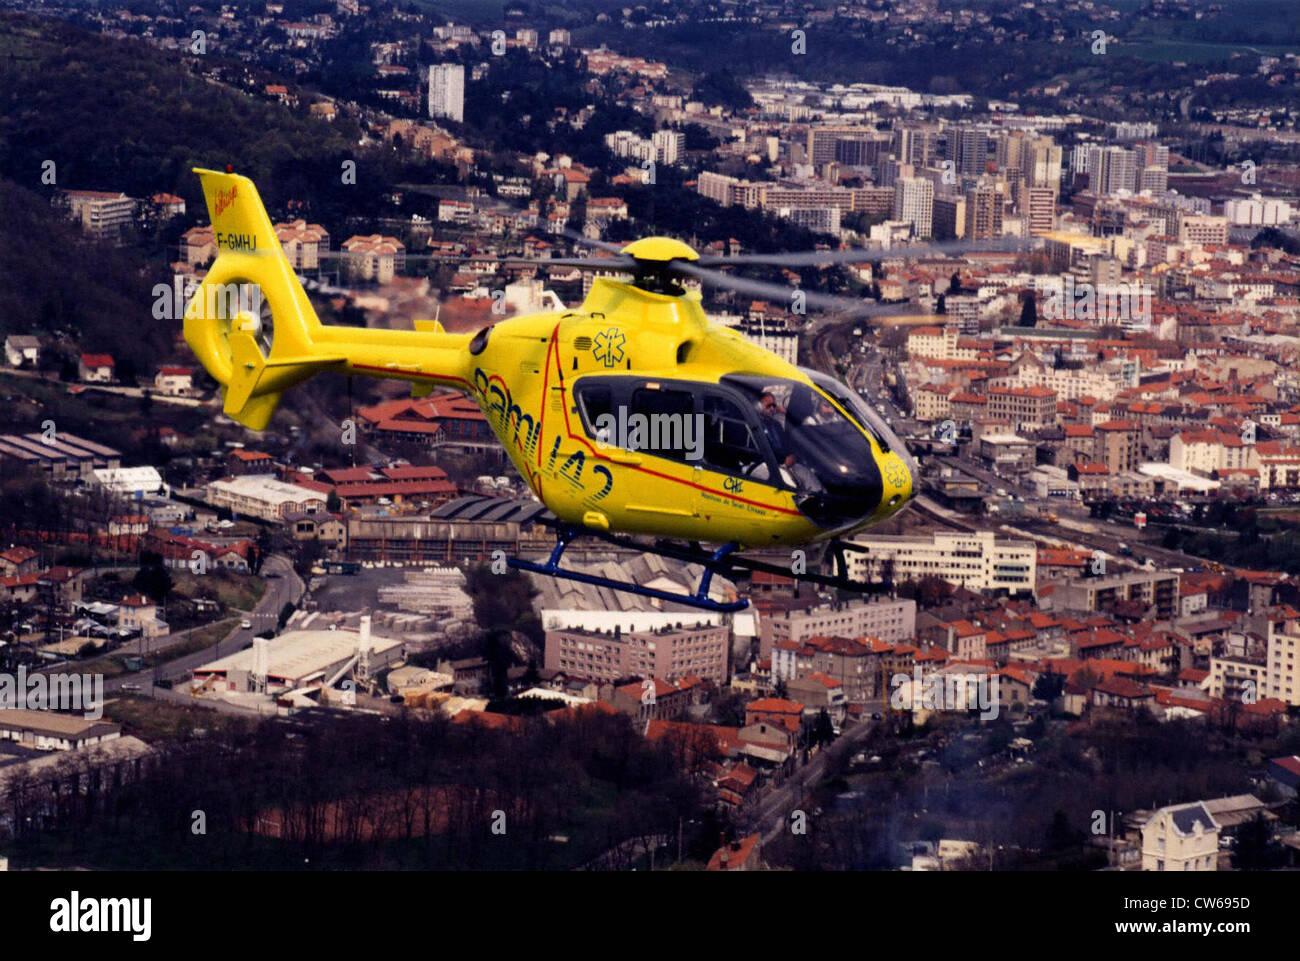 Franco-German Eurocopter EC 135 helicopter - Stock Image